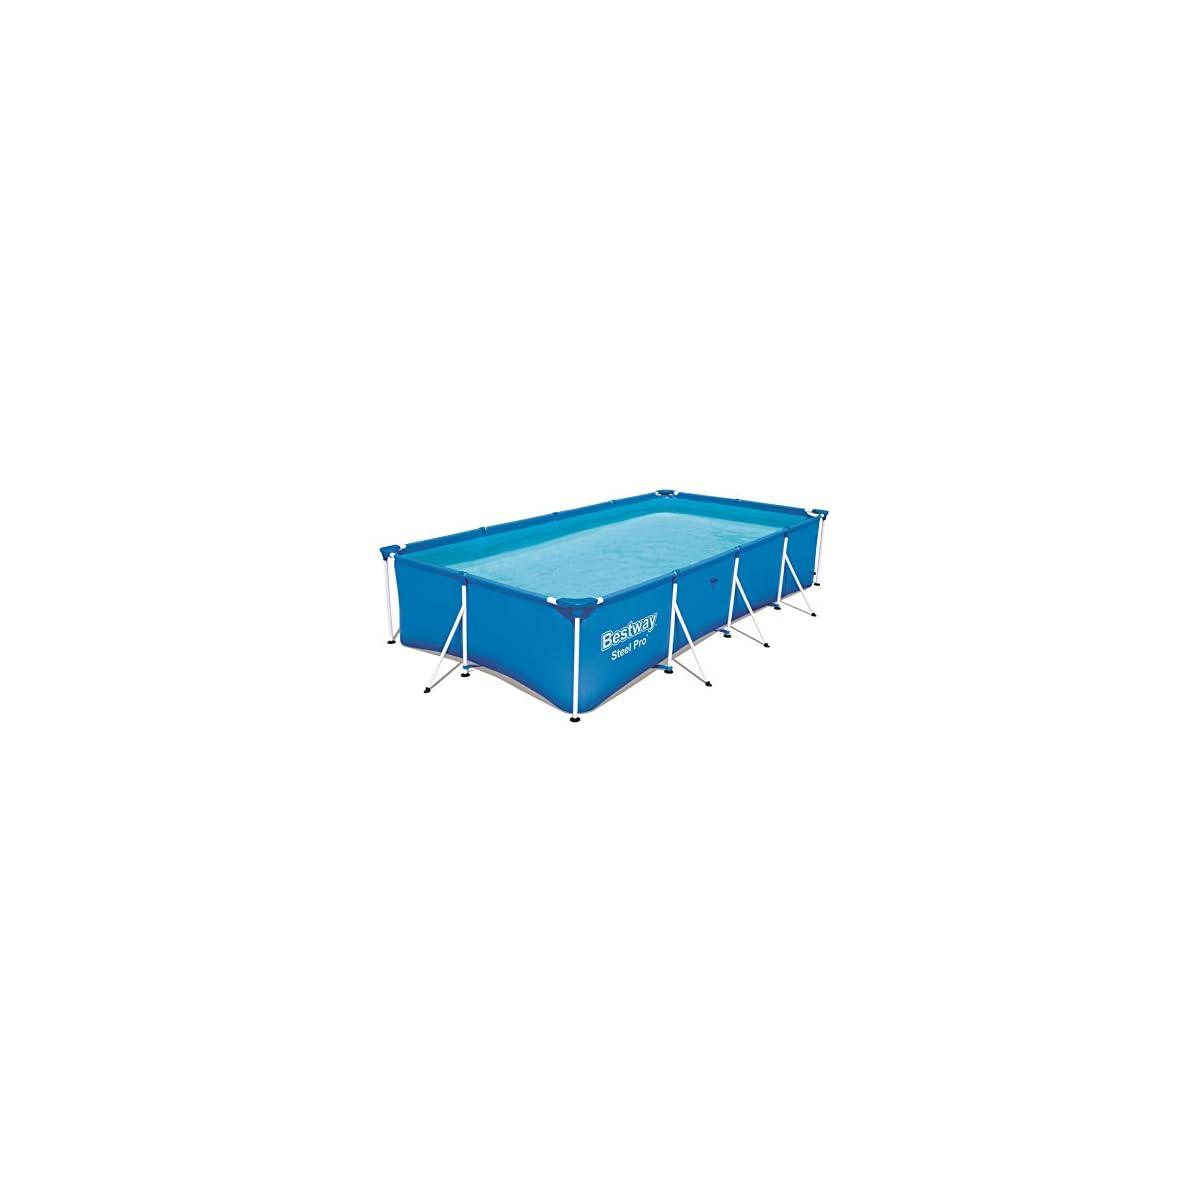 41keFgCbdKL. SS1200  - Bestway Steel Pro 56405 - Piscina (Piscina con Anillo Hinchable, Rectangular, 5700 L, Azul, PVC, Acero)